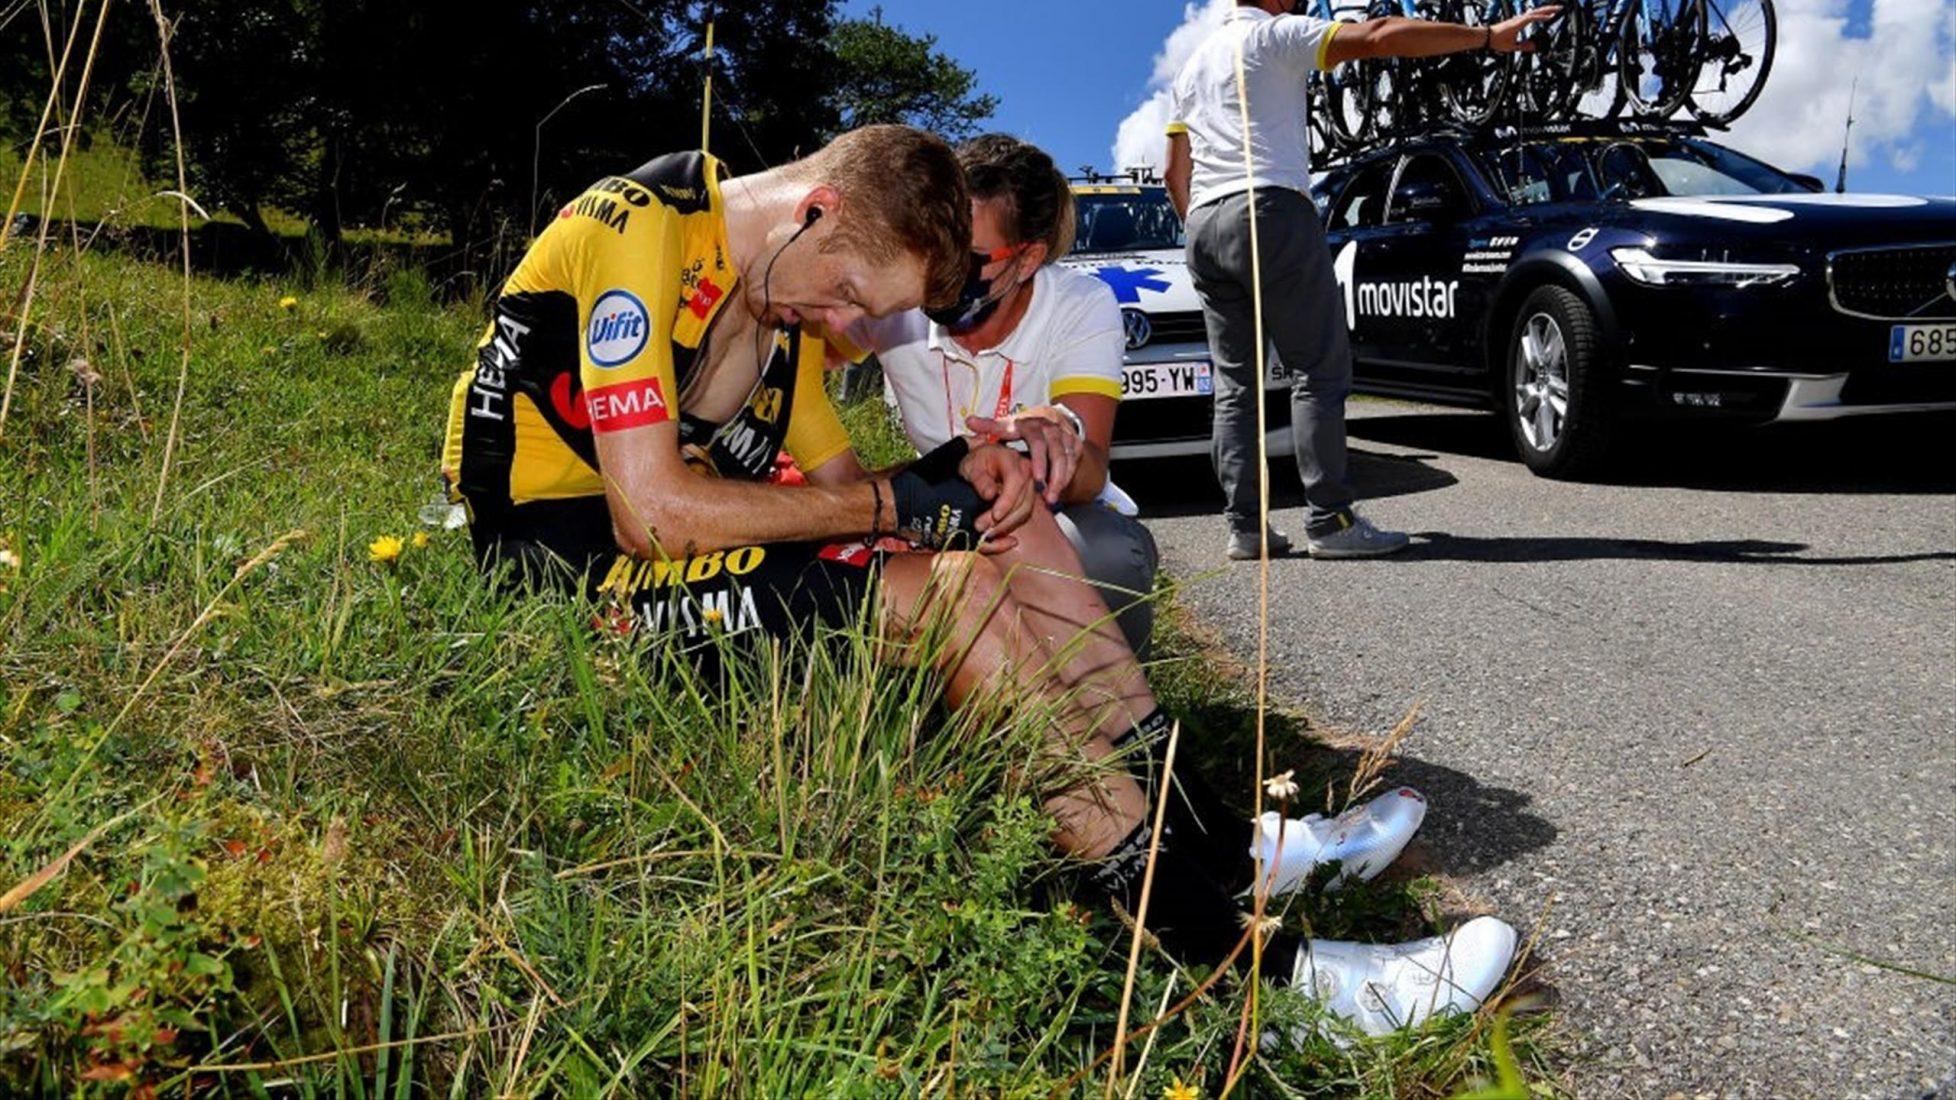 Steven Kruijswijk non parteciperà al Tour, ma al Giro